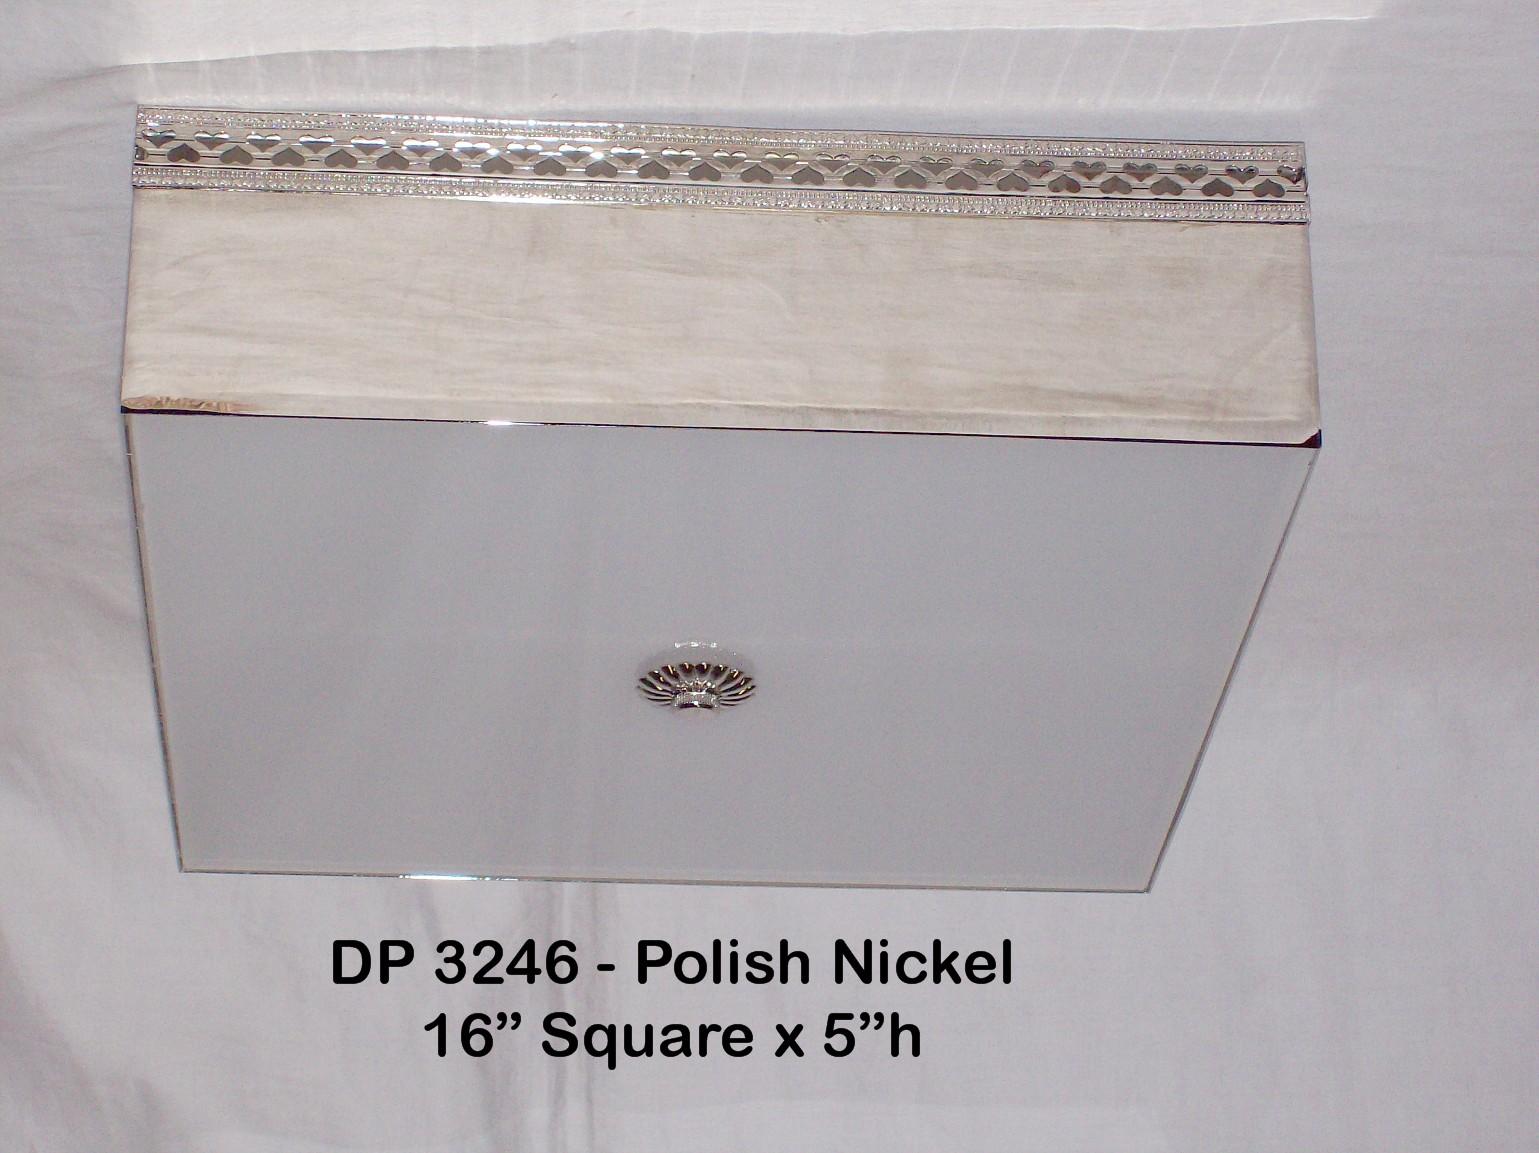 DP 3246